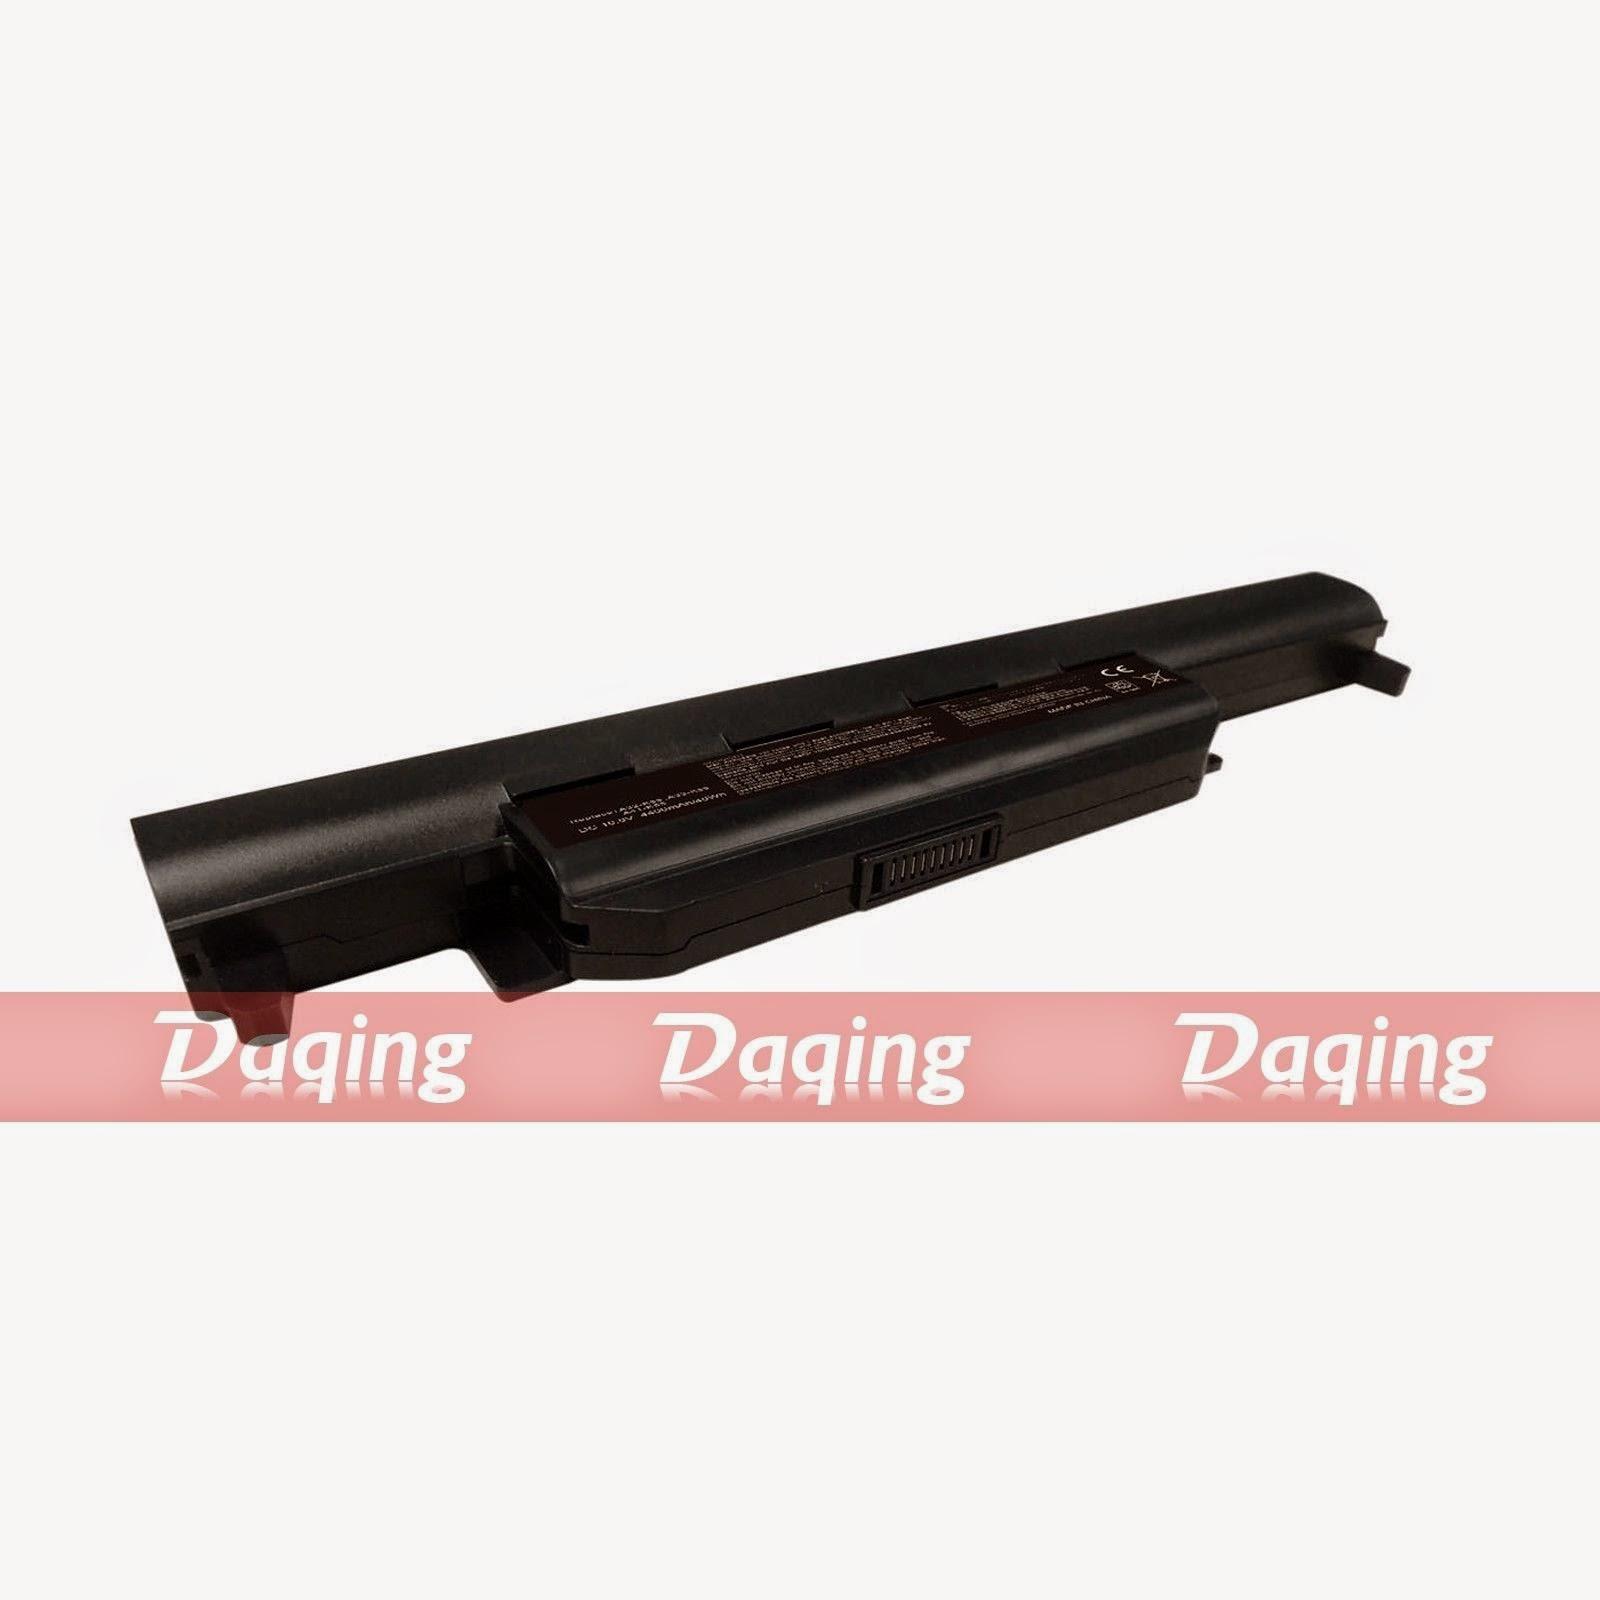 Battery for Asus A45 A55 A75 K45 K55 K75 R400 R500 R700 X55 X45 A32-K55 A33-K55